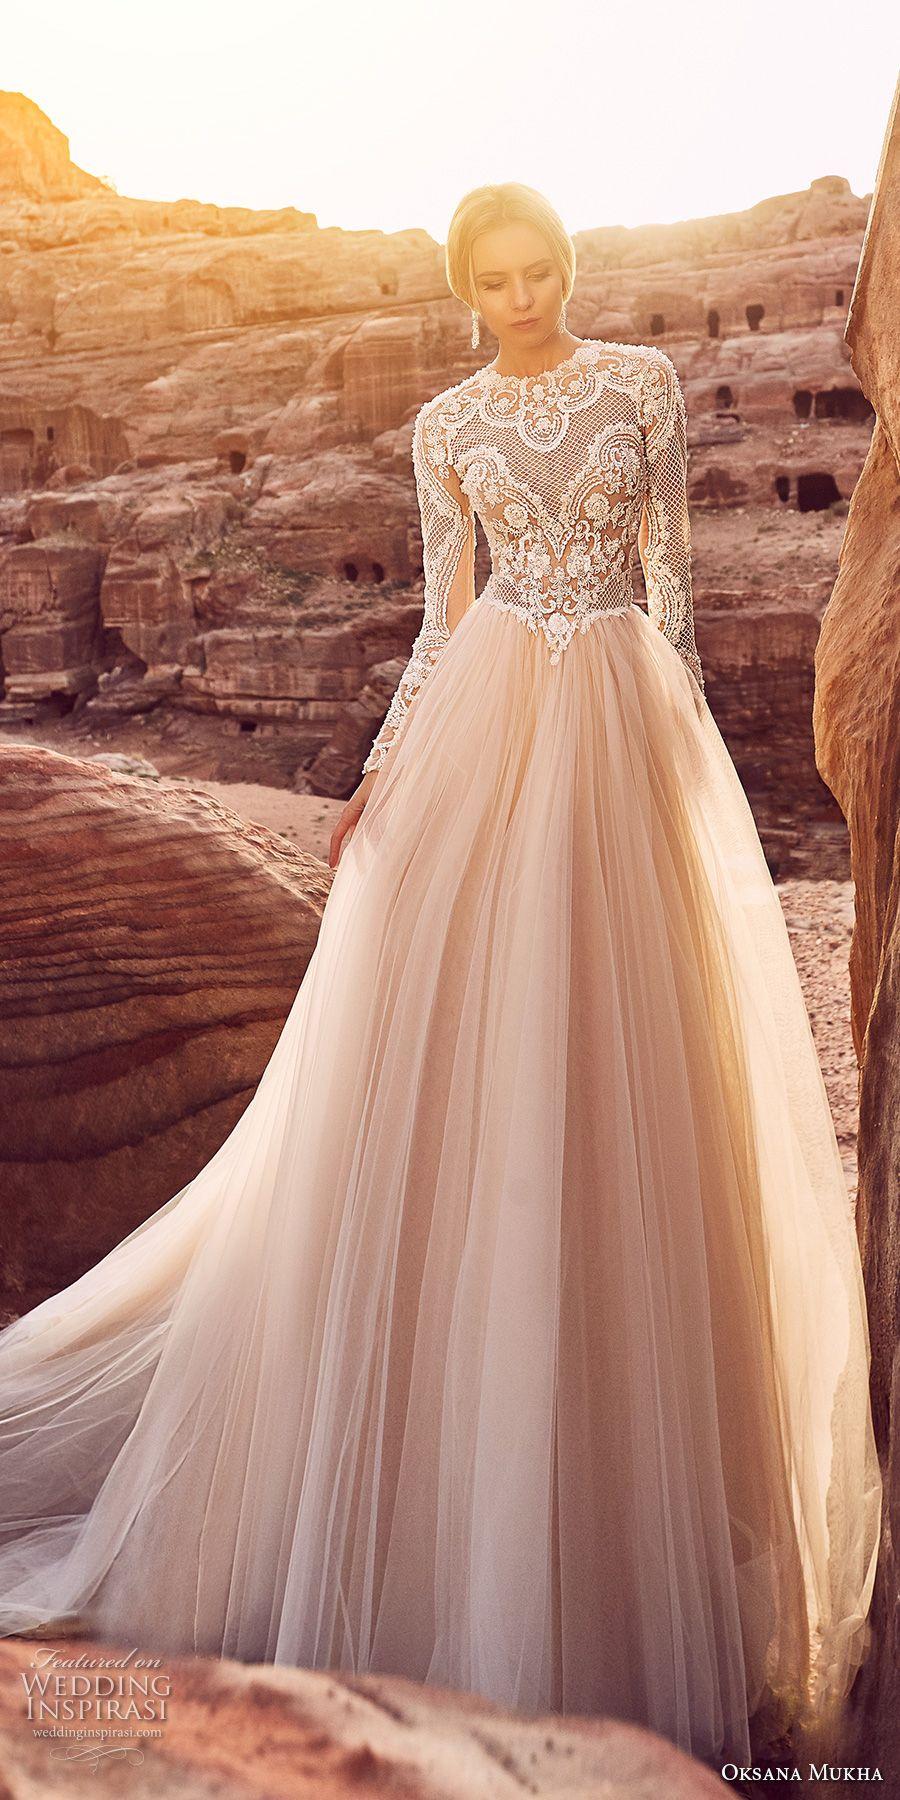 Oksana mukha wedding dresses gowns pinterest wedding